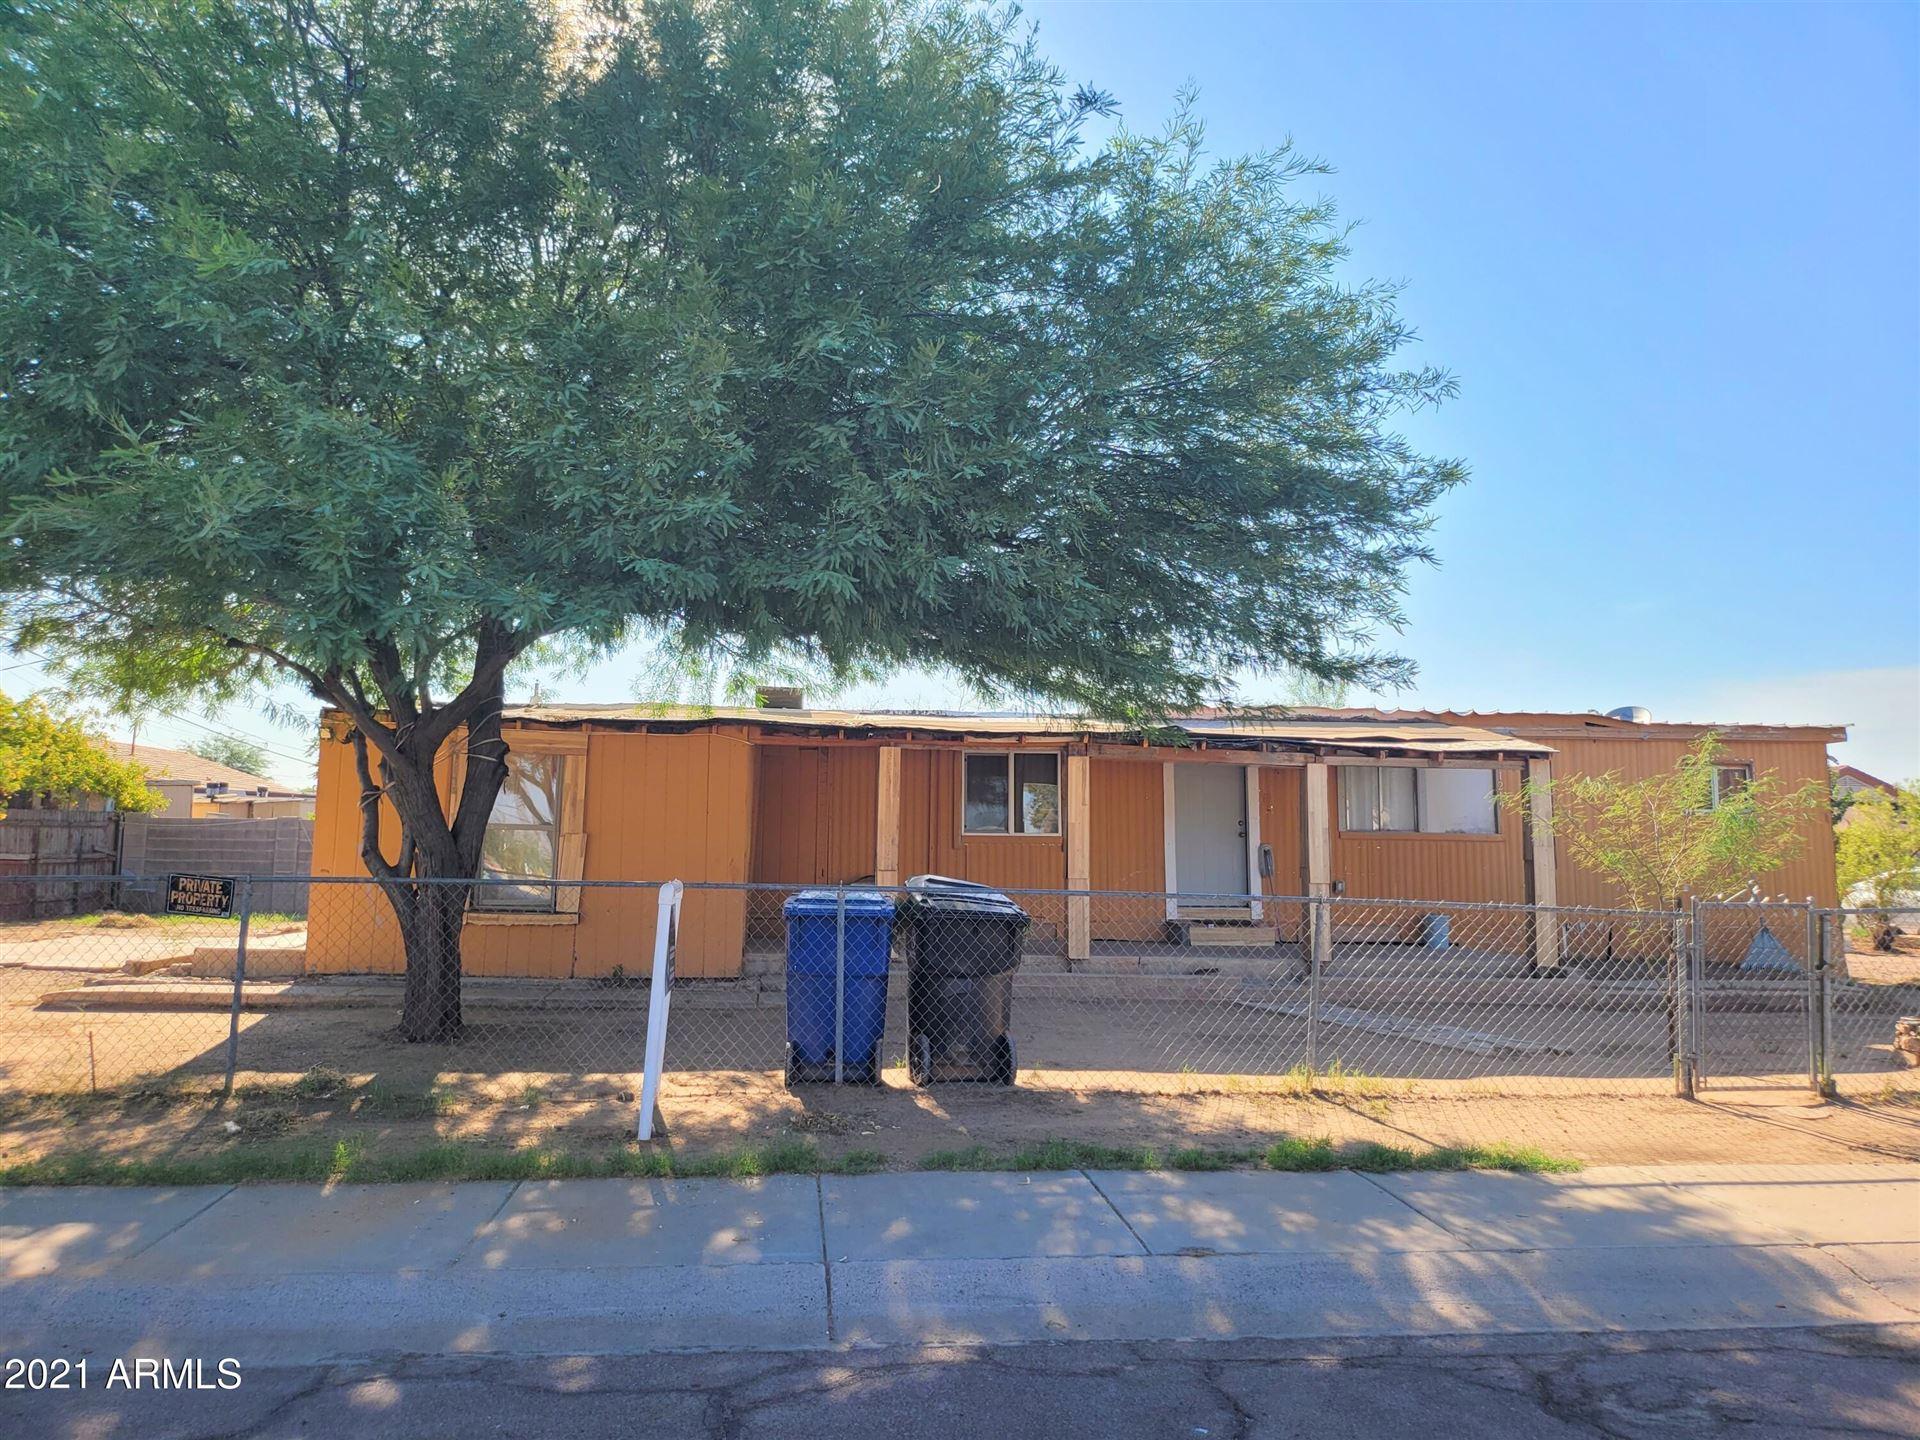 11219 W Hopi Street, Avondale, AZ 85323 - MLS#: 6250062